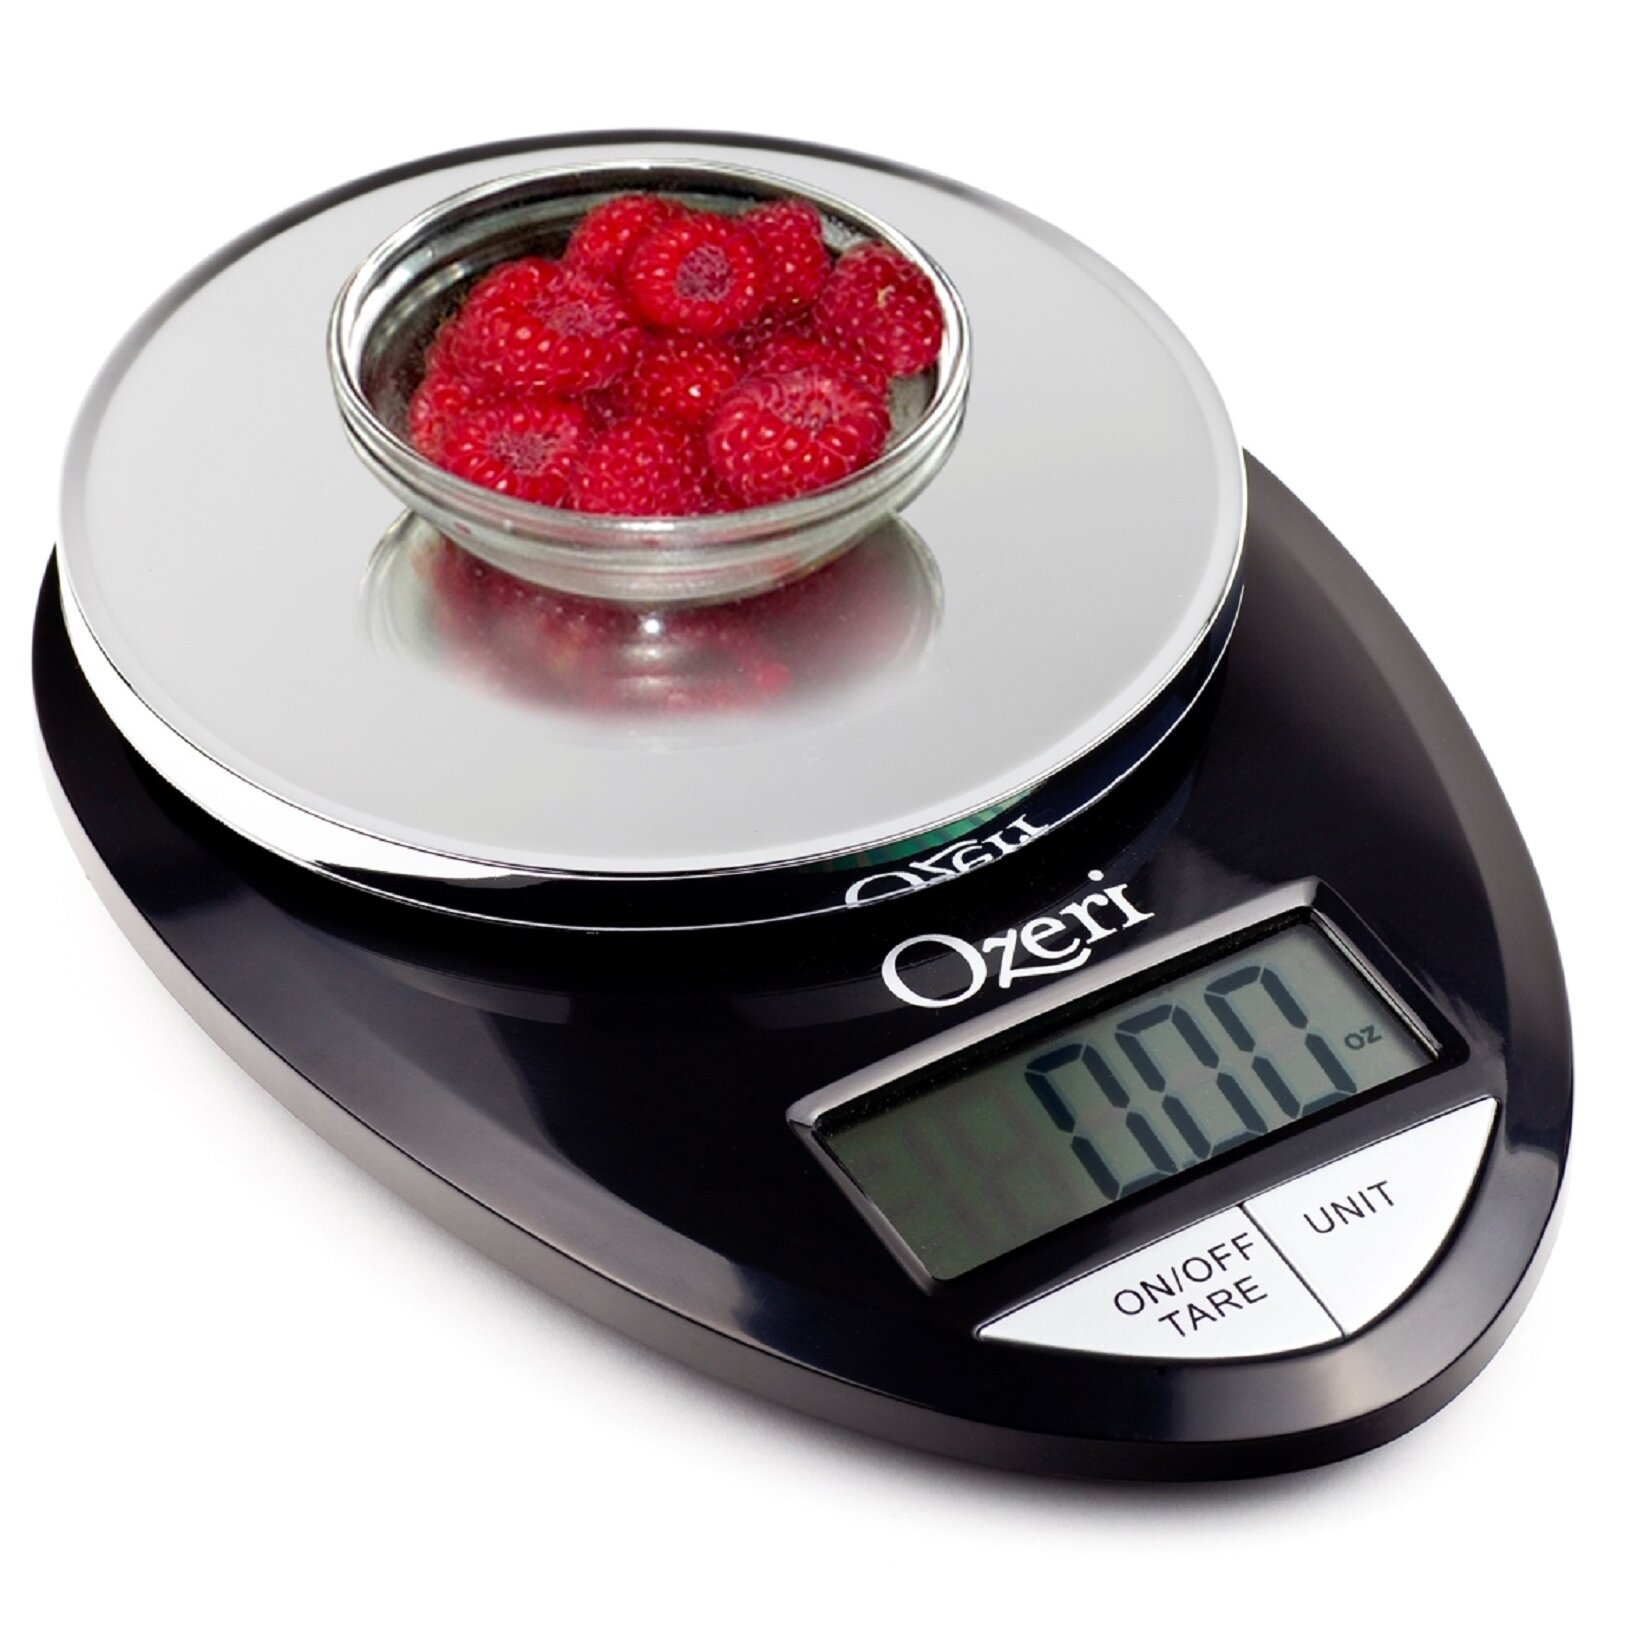 Ozeri Pro Digital Kitchen Food Scale Oz To 12 Lbs 1 Gram To 5 4 Kg Reviews Wayfair